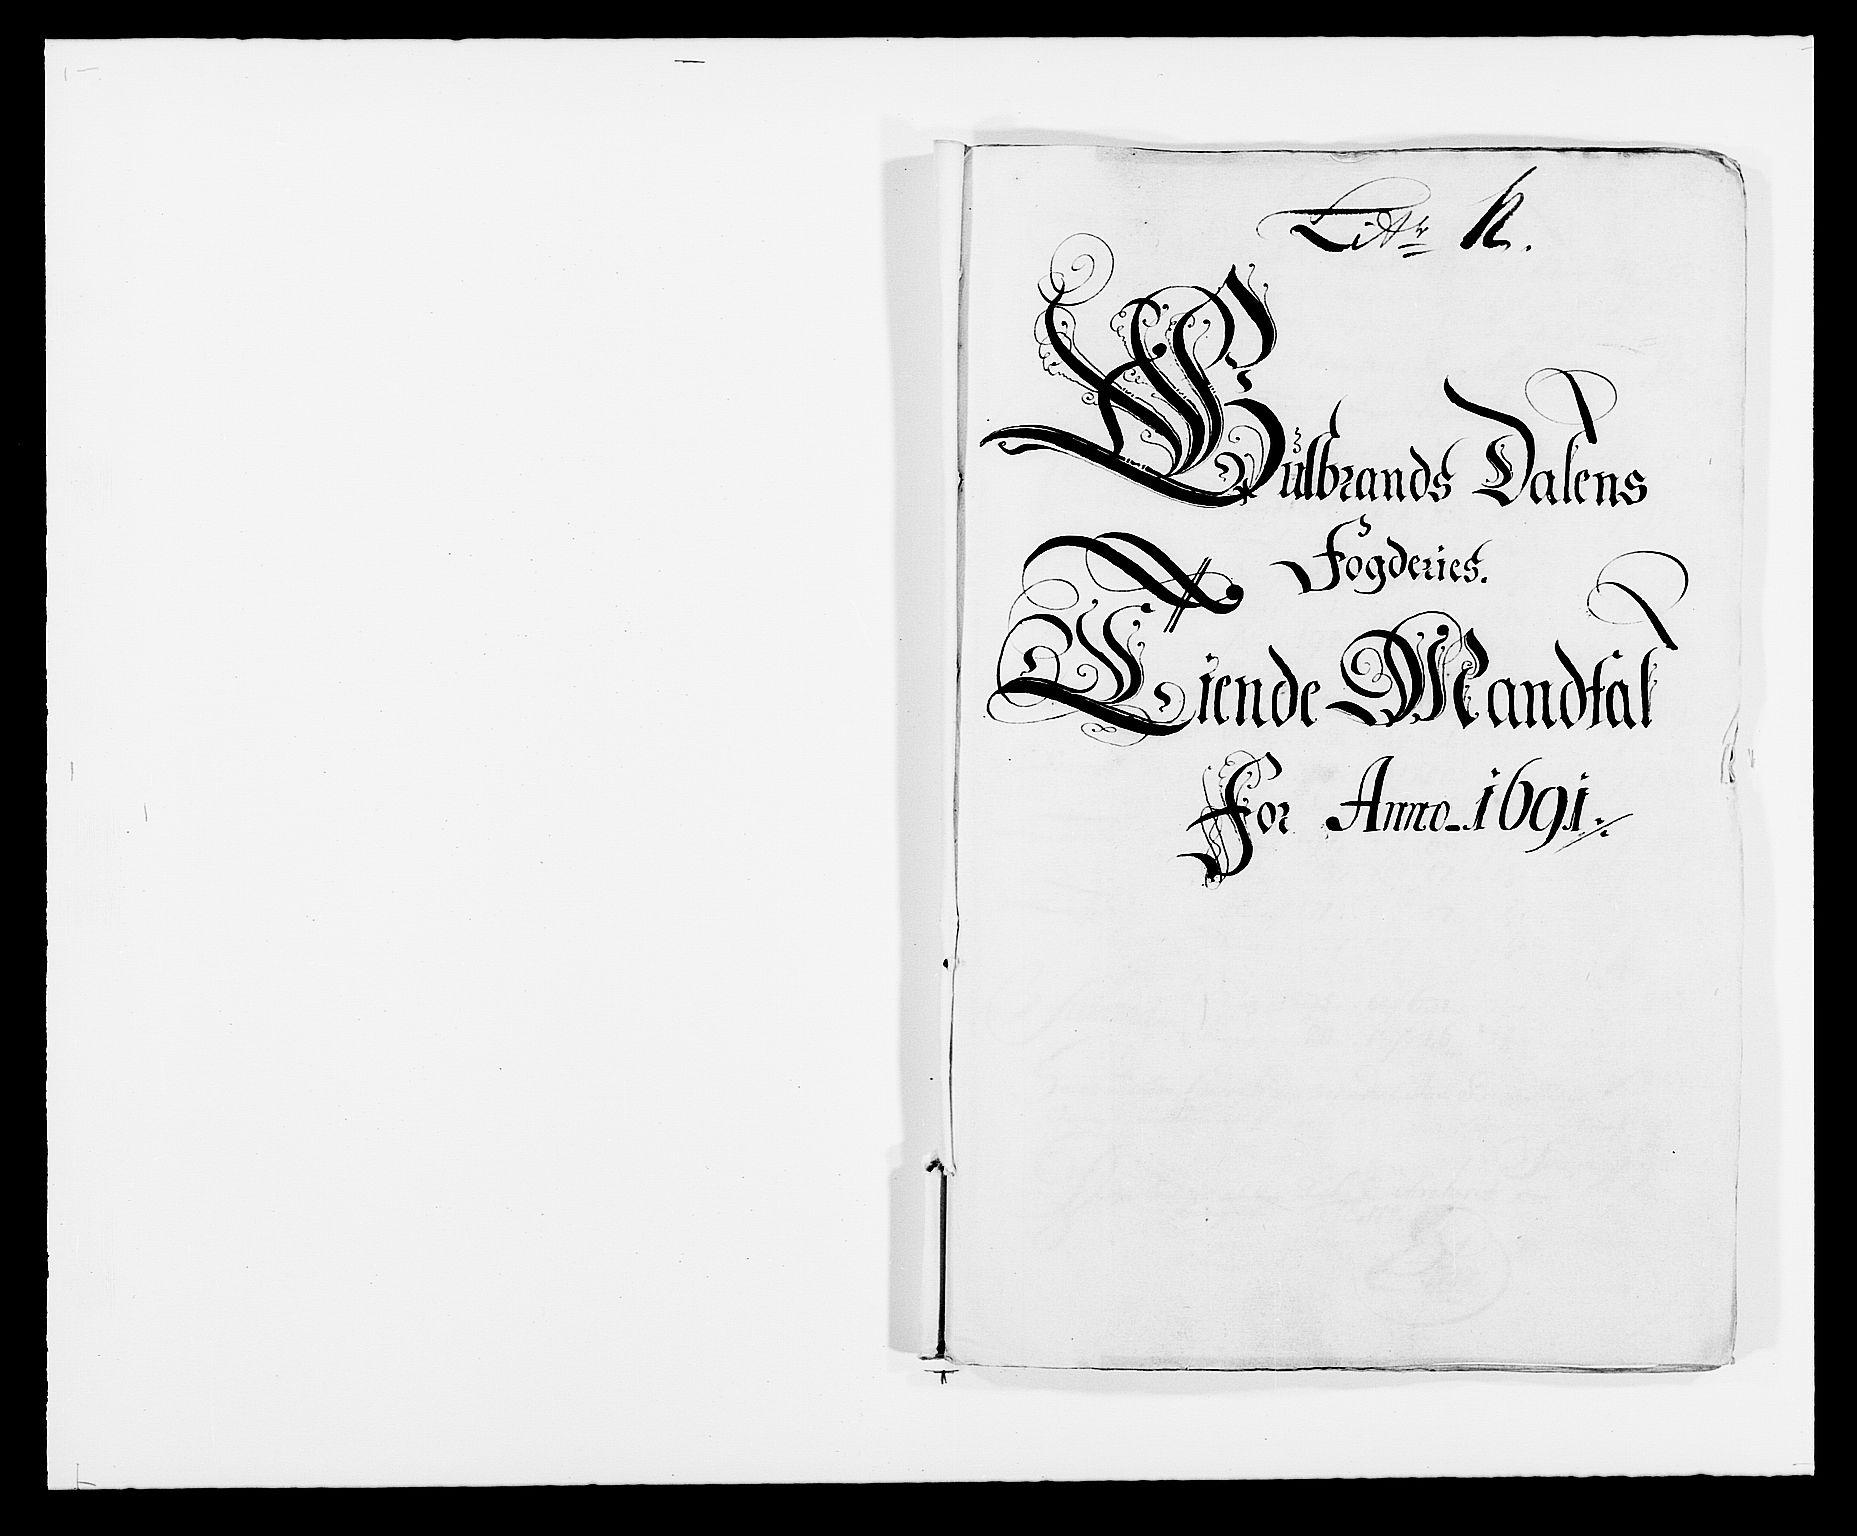 RA, Rentekammeret inntil 1814, Reviderte regnskaper, Fogderegnskap, R17/L1165: Fogderegnskap Gudbrandsdal, 1690-1692, s. 211